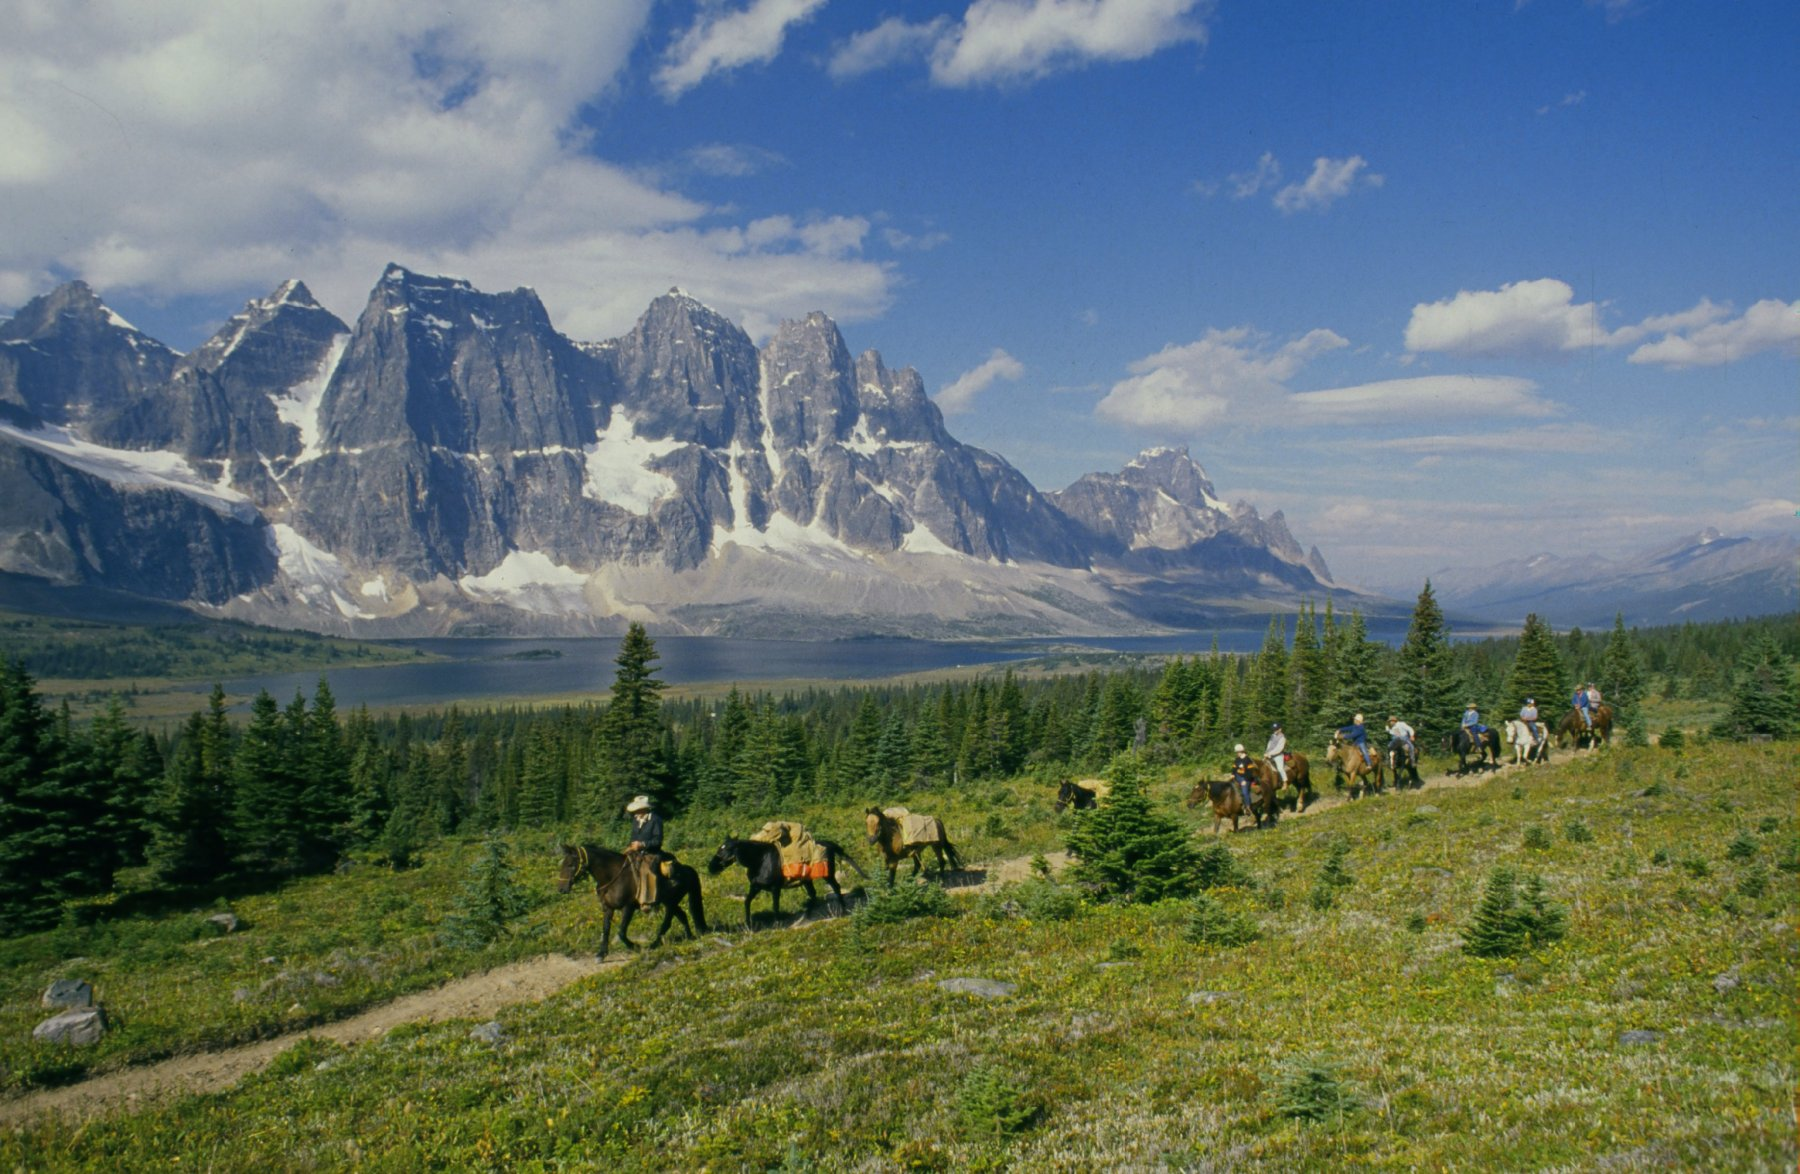 Alberta's Backcountry by Horseback